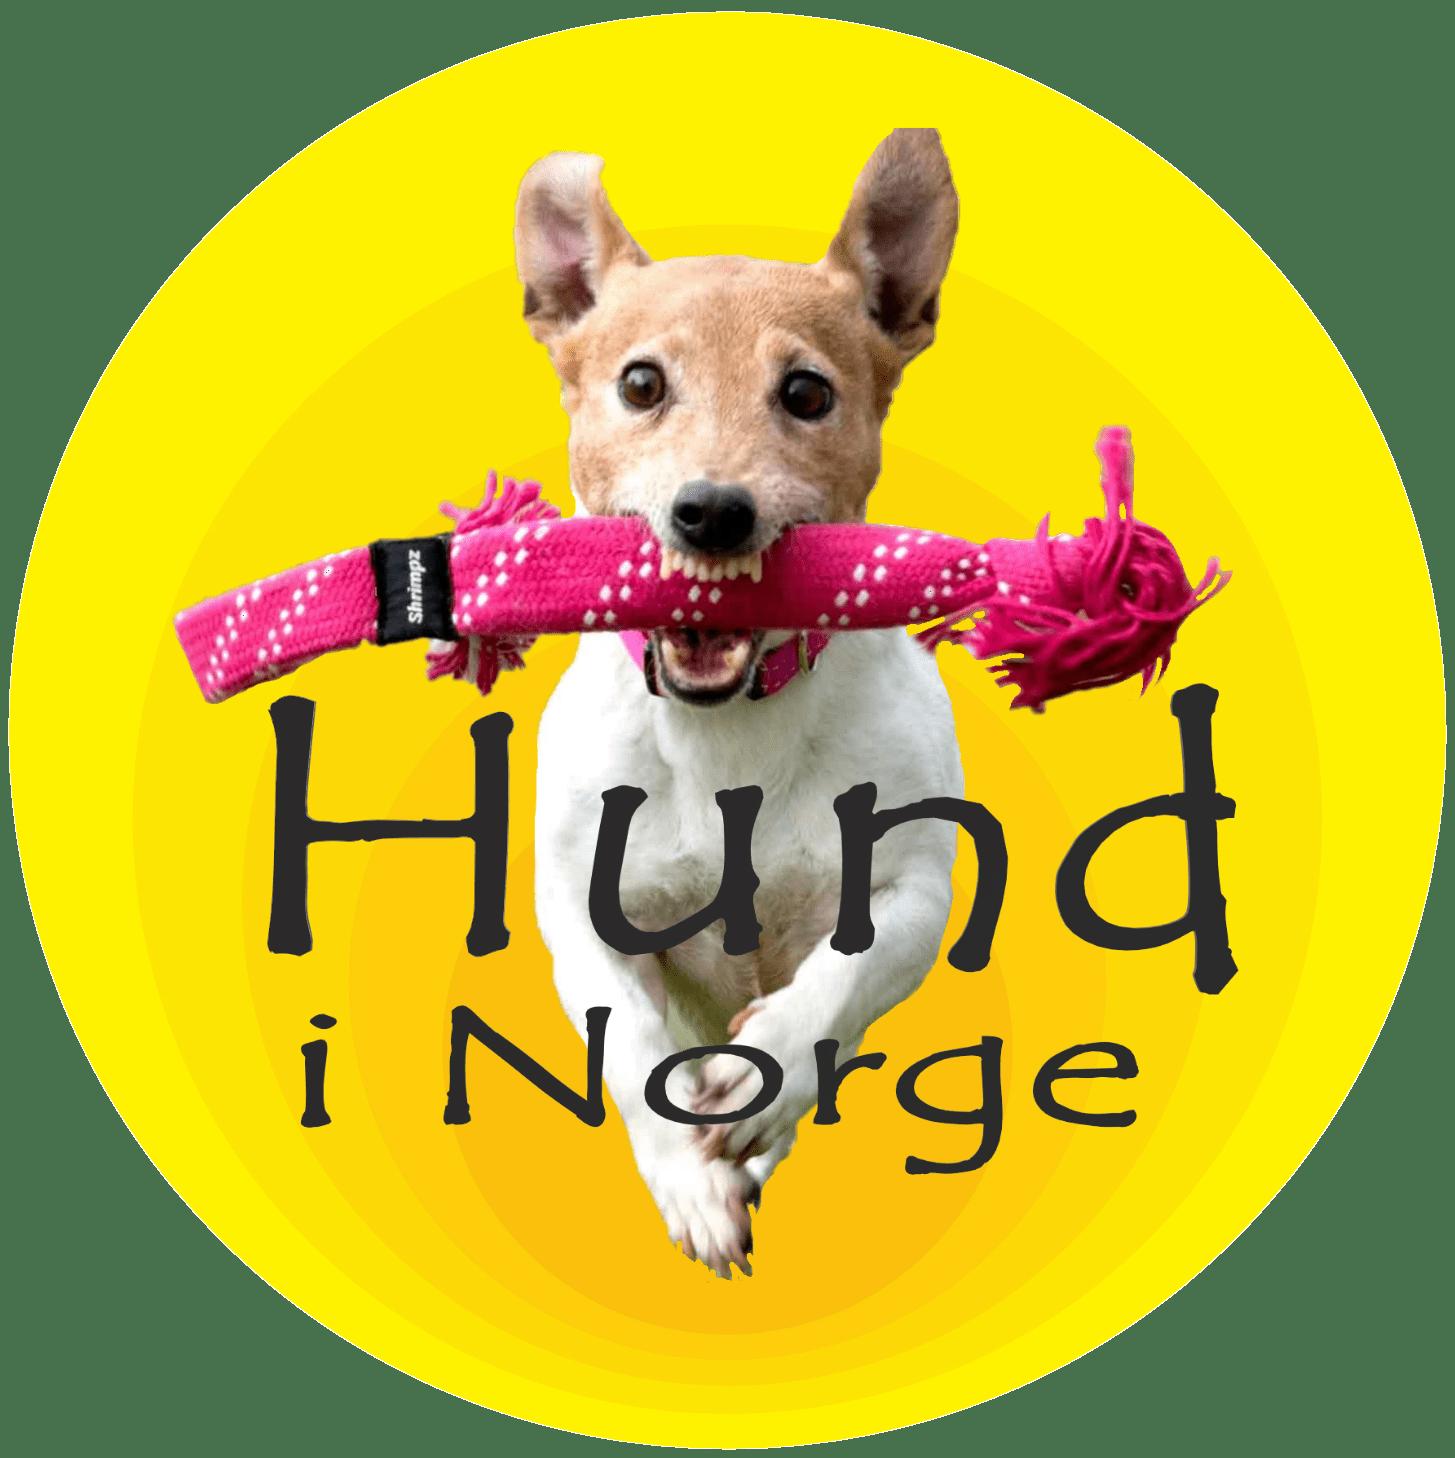 hundinorge.no